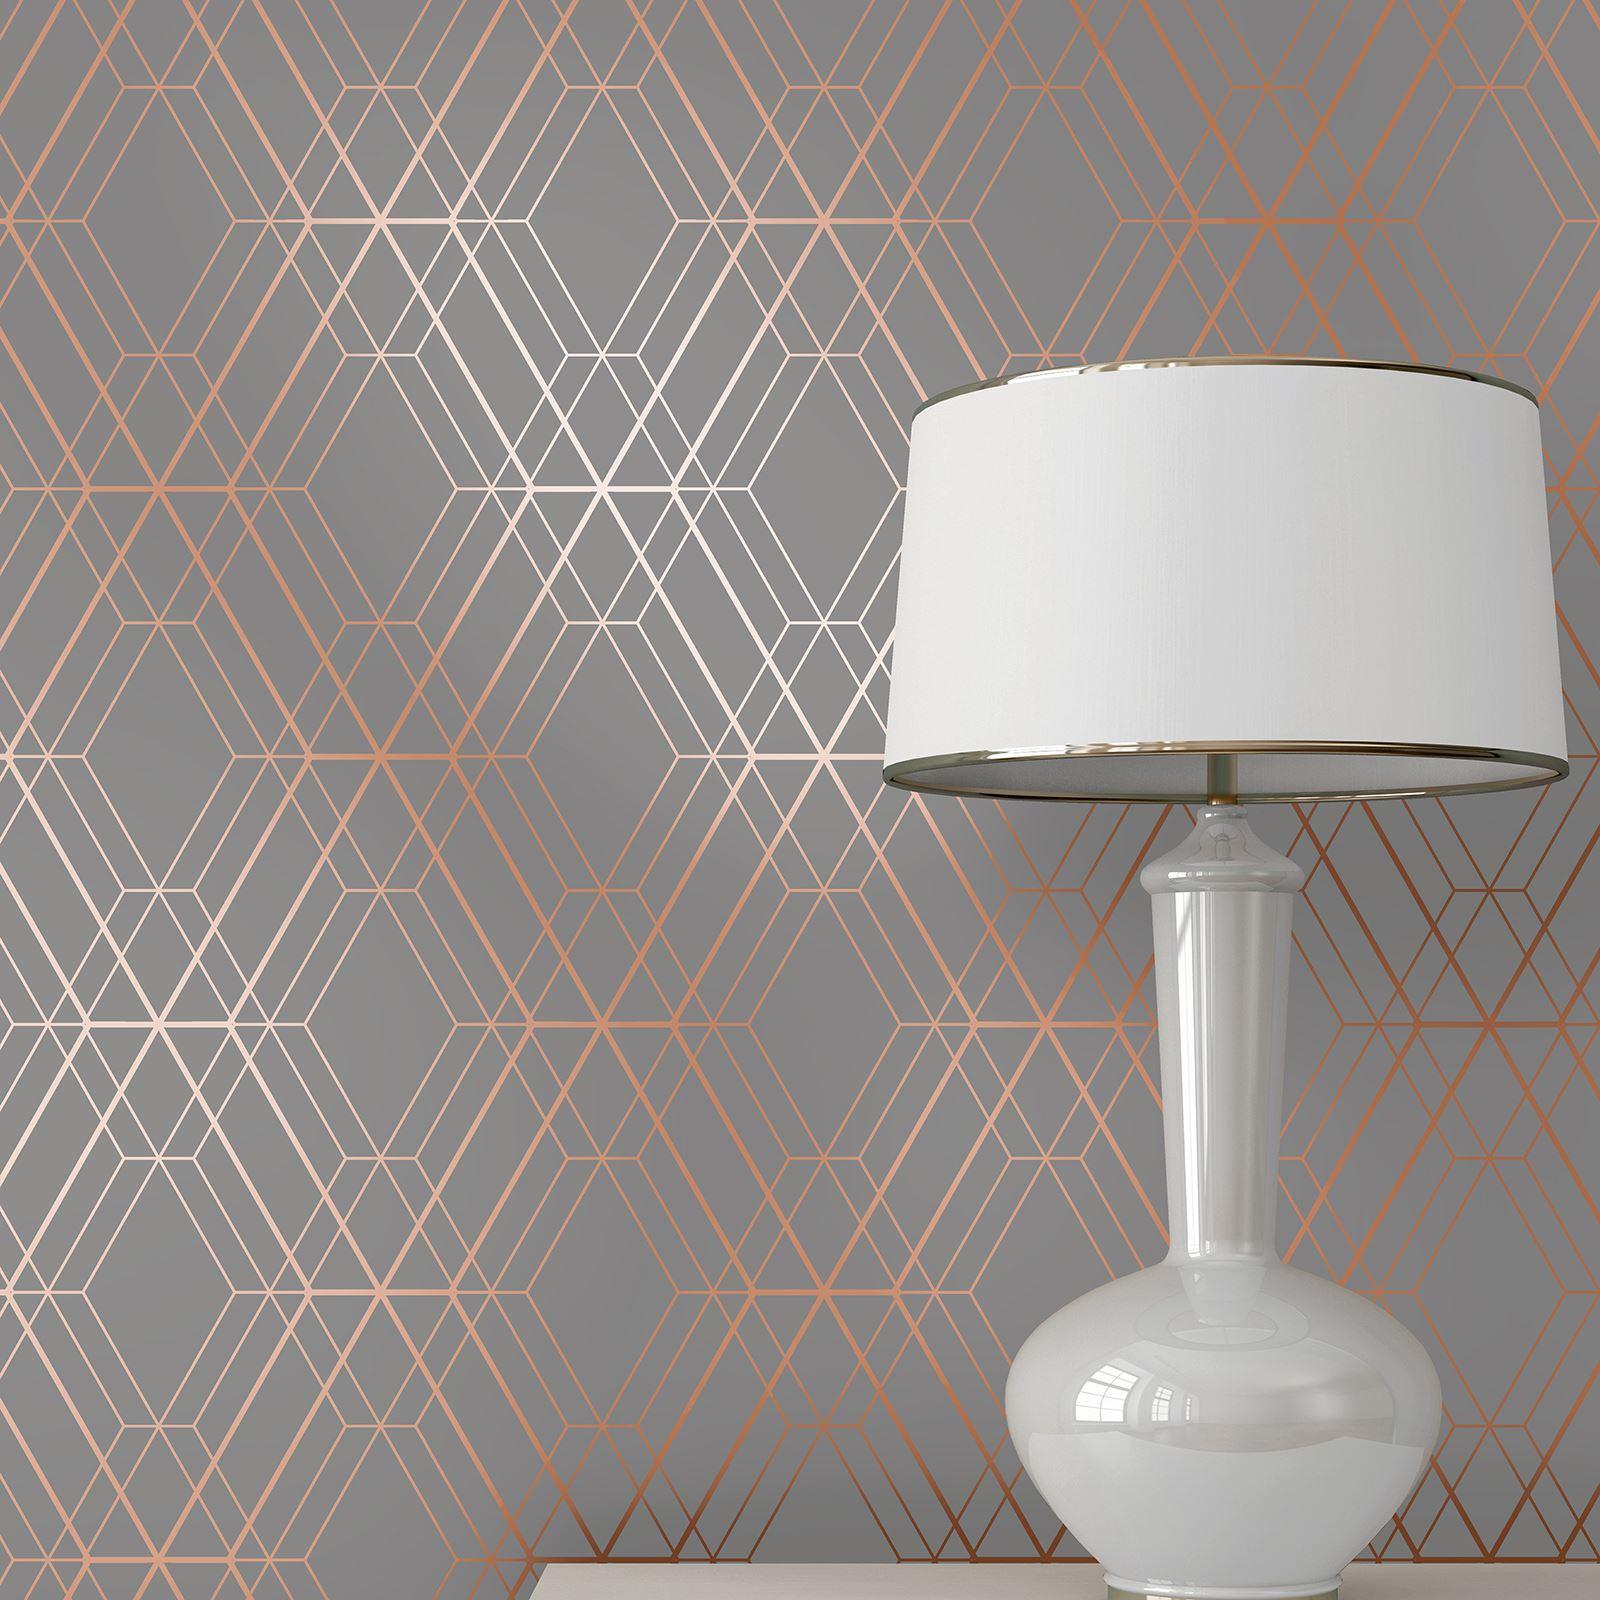 miniatura 30 - Carta da Parati Geometrica Arredamento Camera Moderno Vari Disegni e Colori